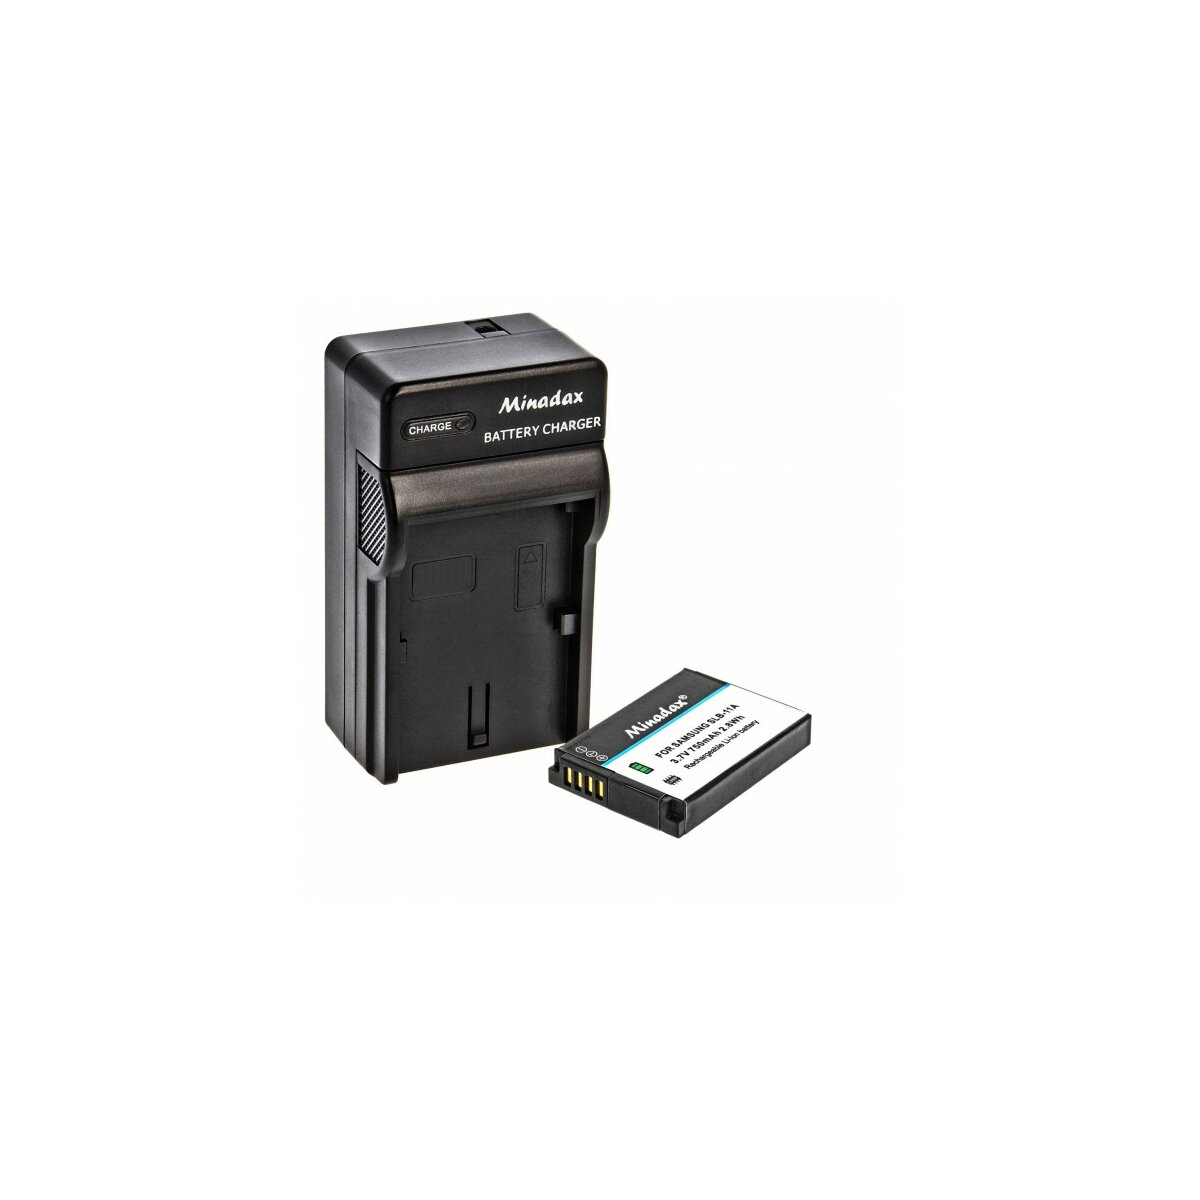 Minadax® Ladegeraet 100% kompatibel fuer Samsung SLB-11A inkl. Auto Ladekabel, Ladeschale austauschbar + 1x Akku wie SLB-11A